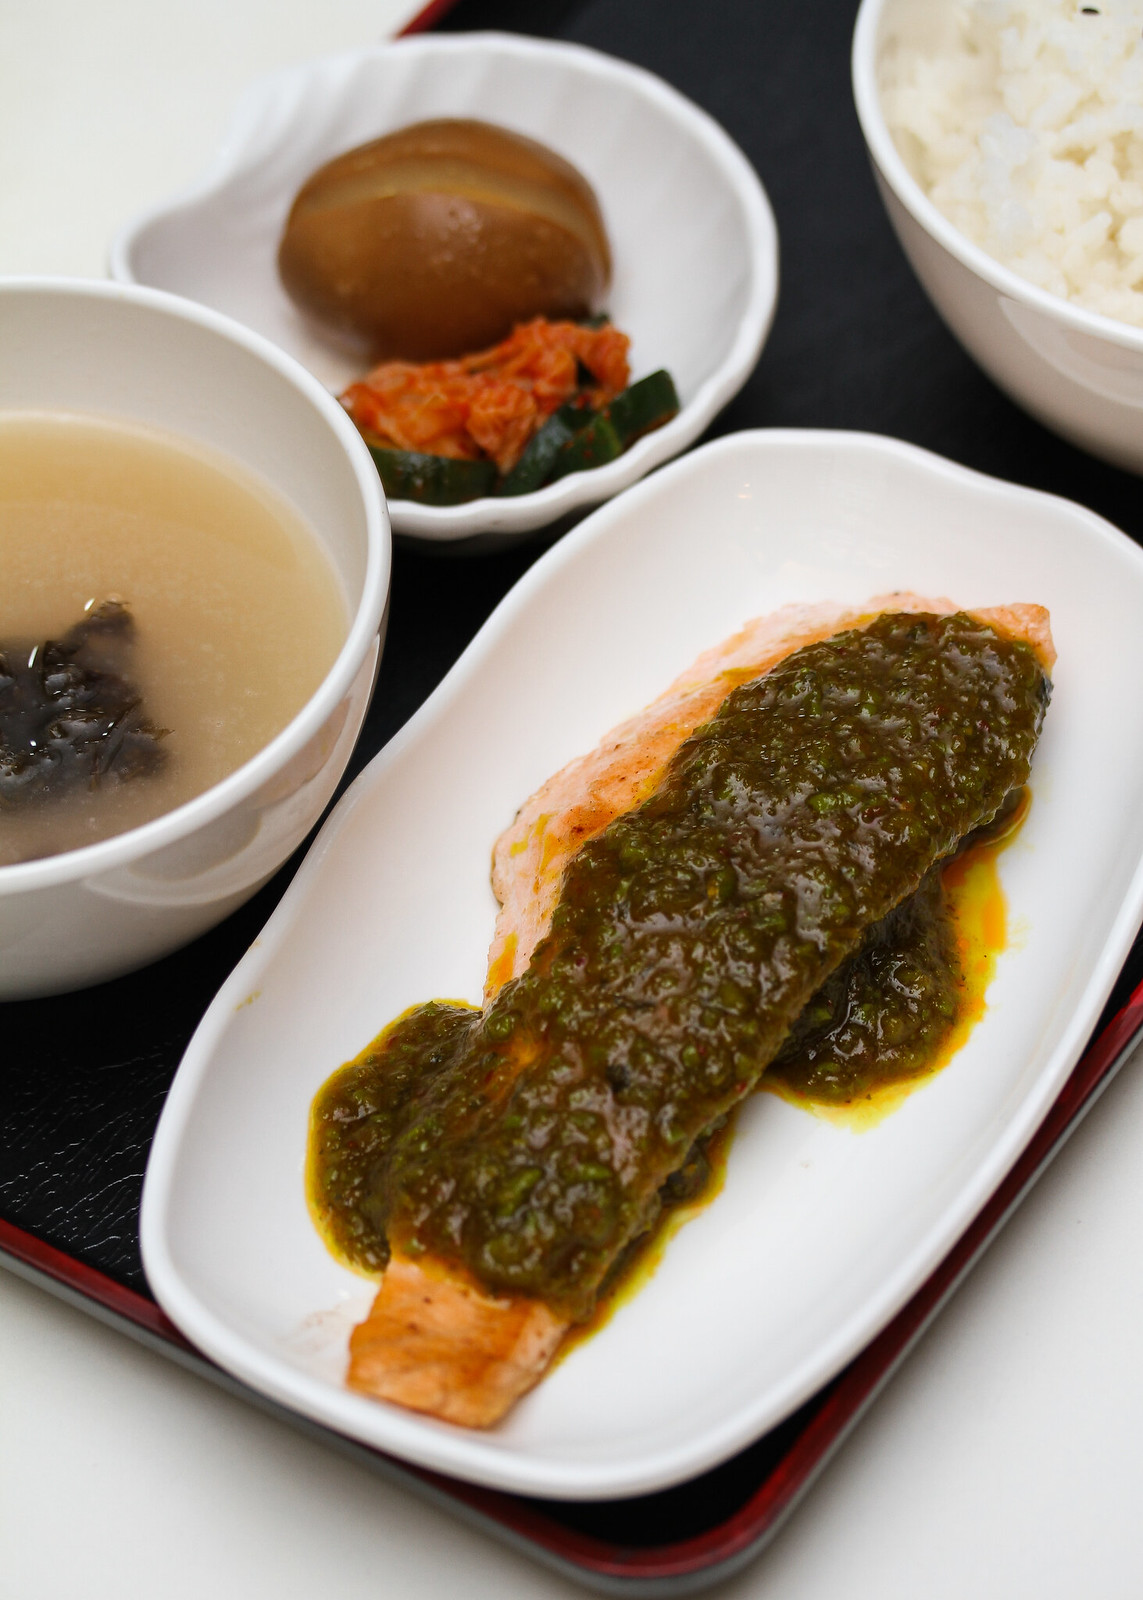 Taste of Taiwan - Salmon